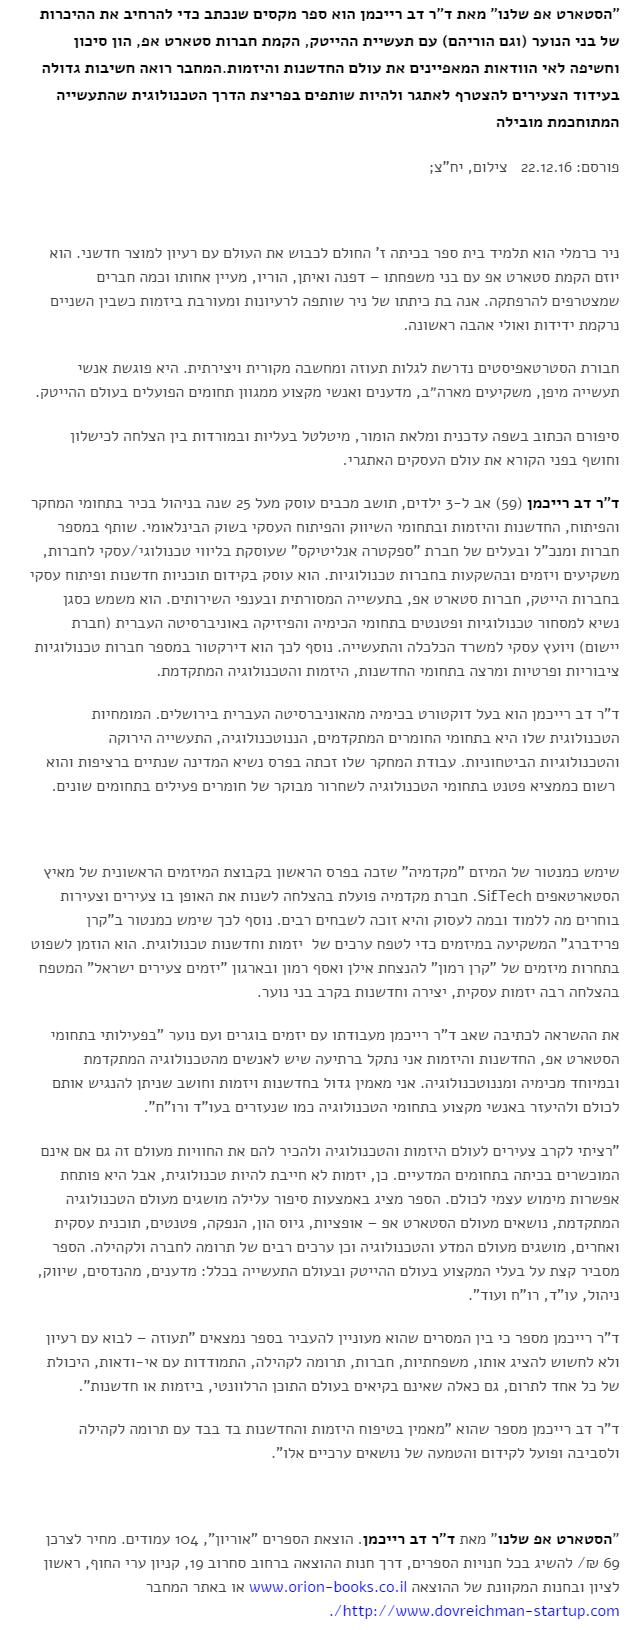 סטטוס-ספר-נוער-חדש-הסטארט-אפ-שלנו-מאת-ד-ר-דב-רייכמן-סטטוס